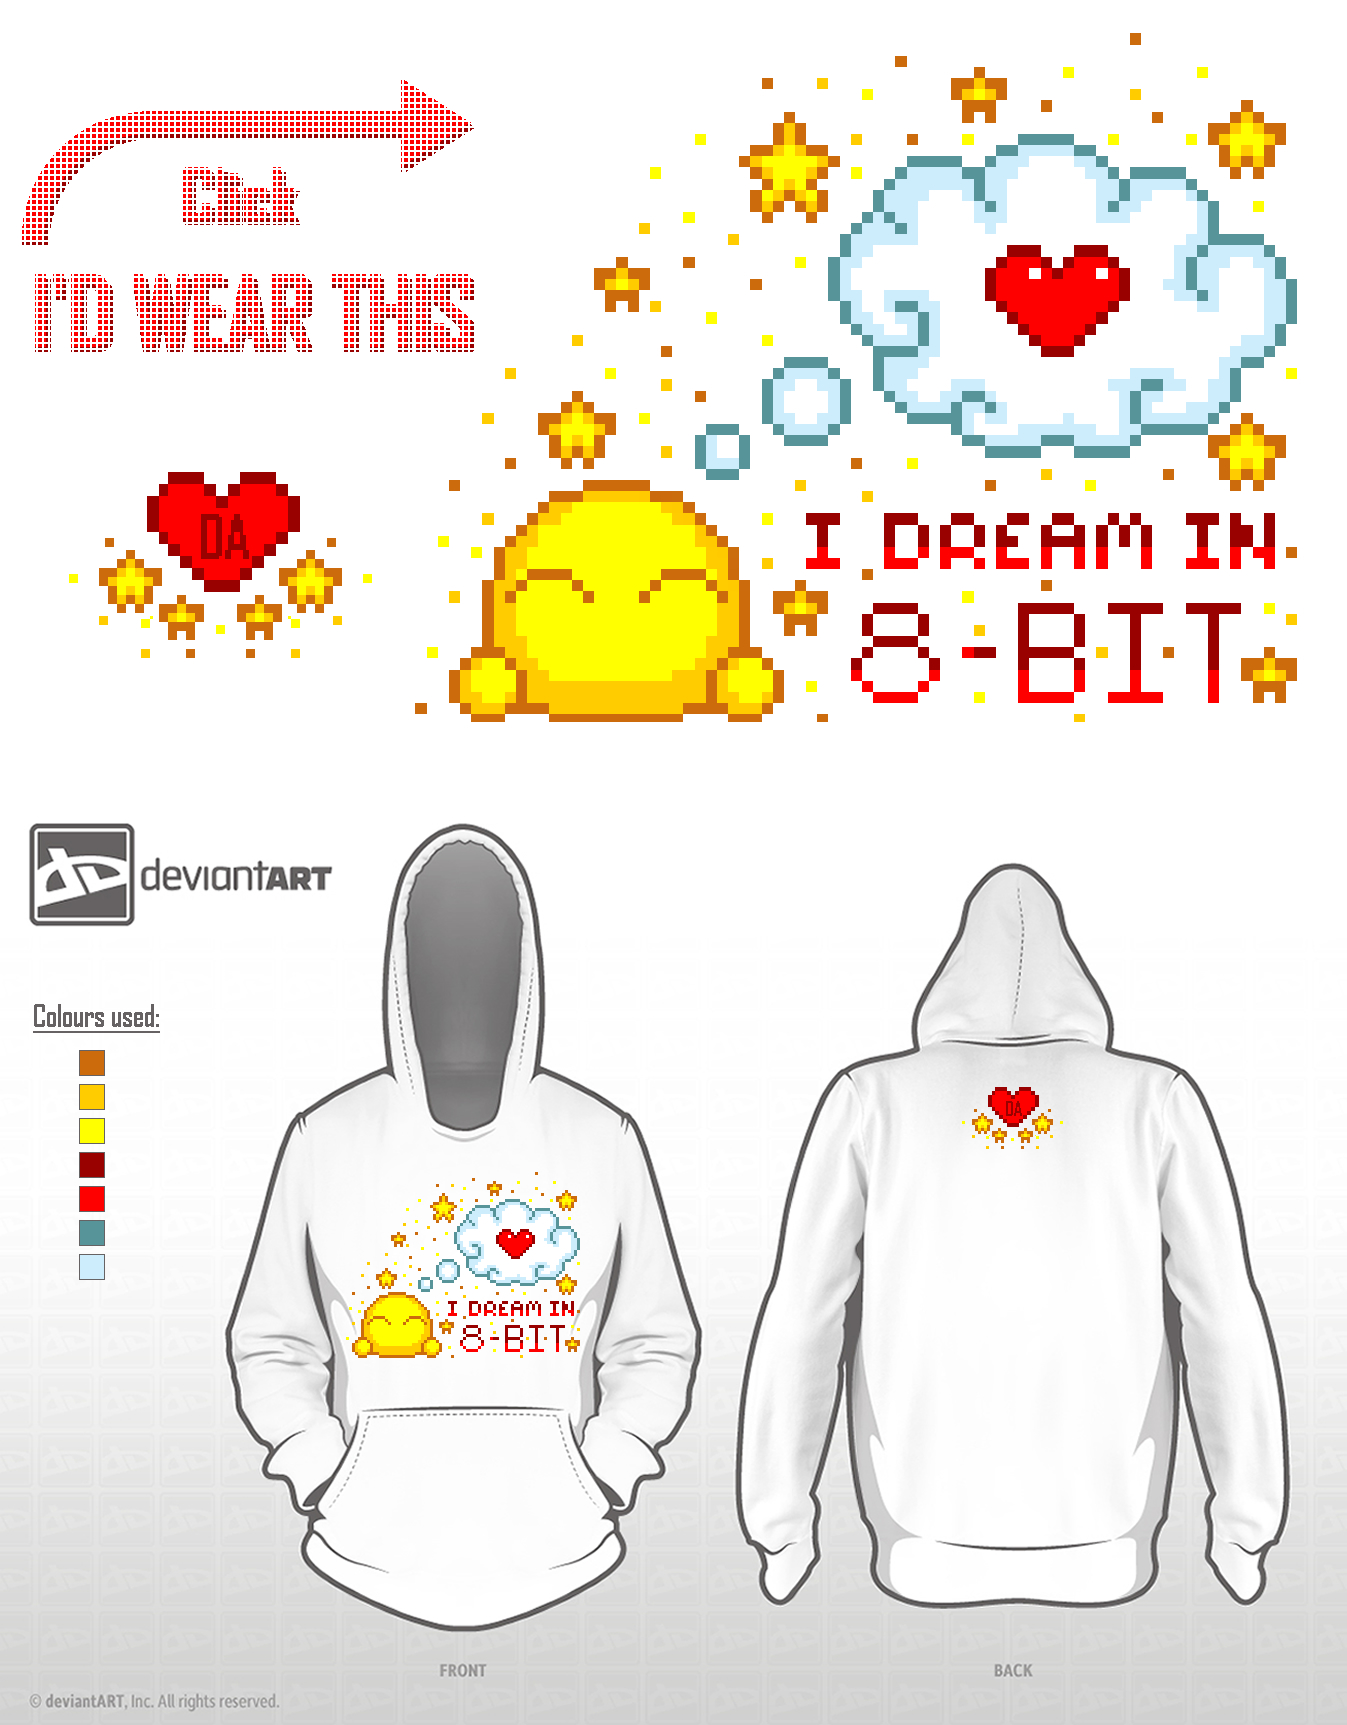 I dream in 8-Bit - deviantWEAR Challenge Entry by r0se-designs